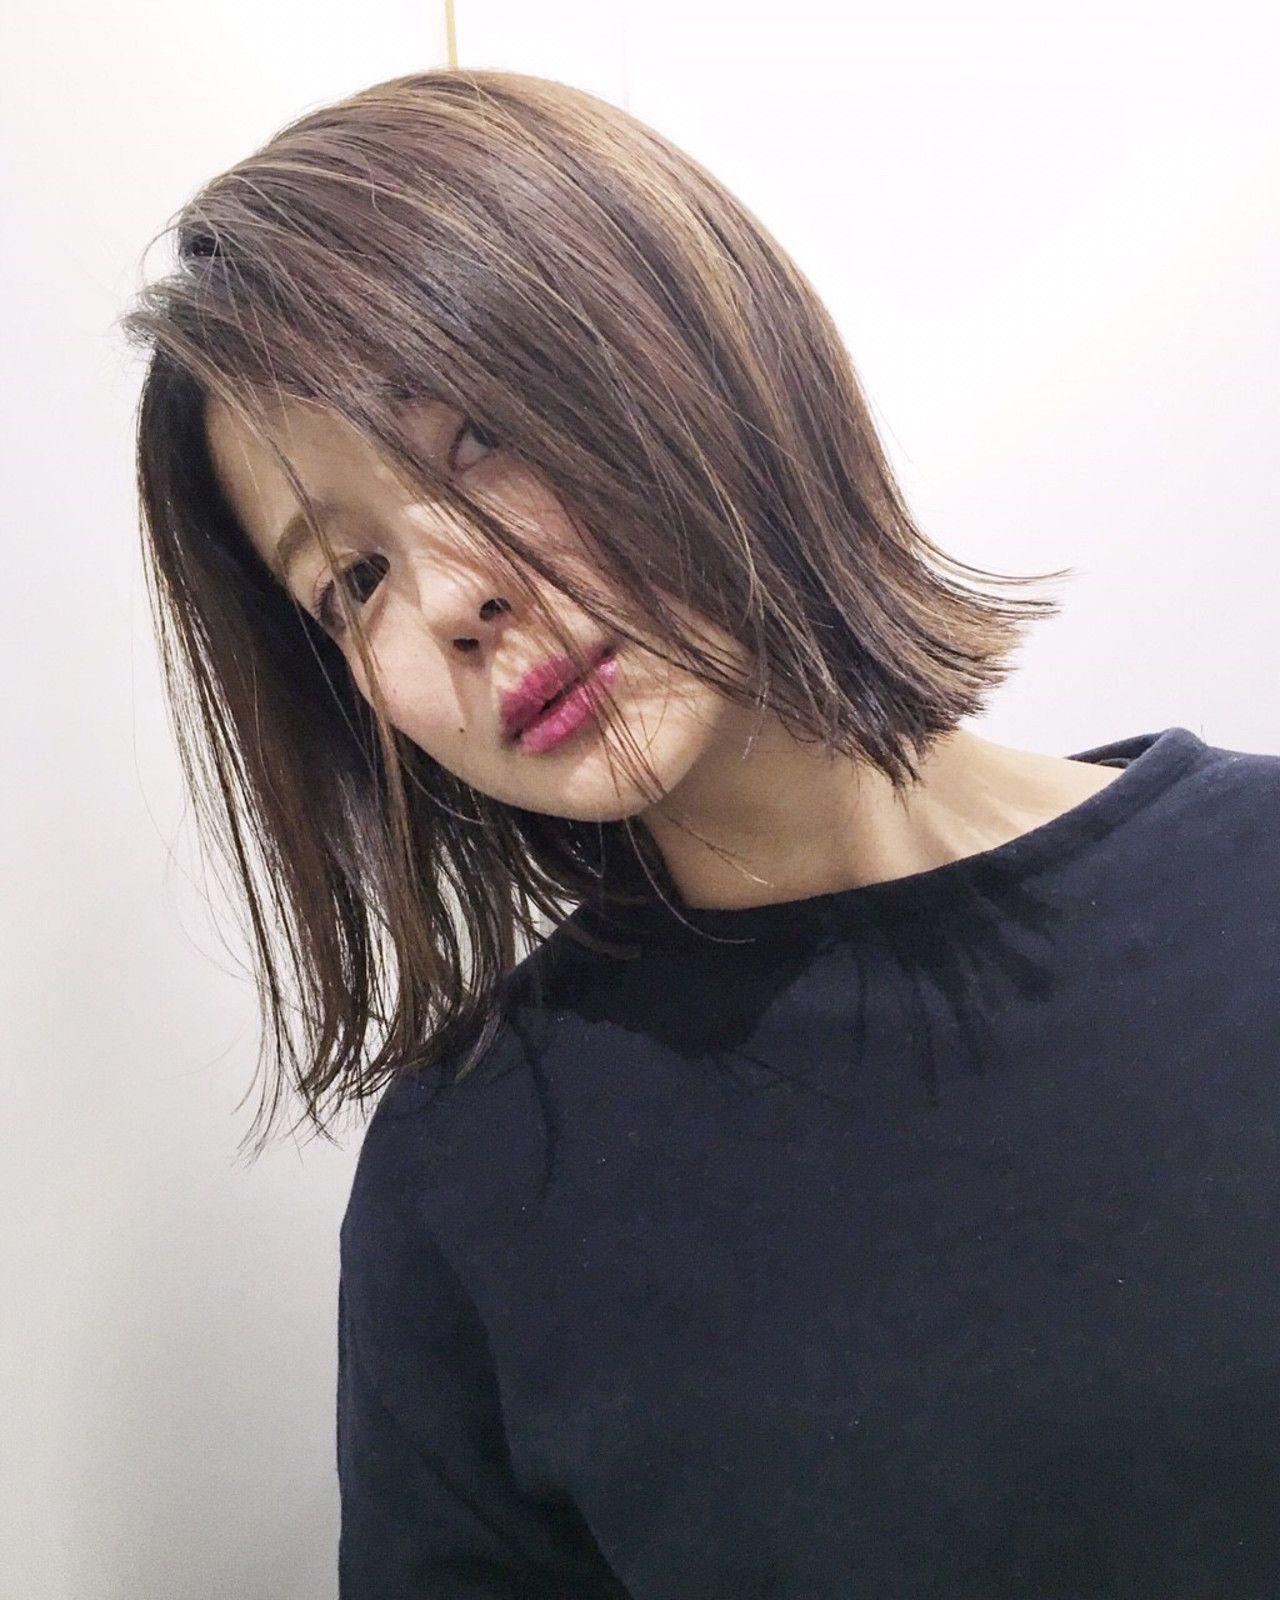 Sachiko Handaさんのヘアカタログ   外国人風,黒髪,ハイライト,ボブ,ナチュラルストレート   2016.05.15 21.40 - HAIR